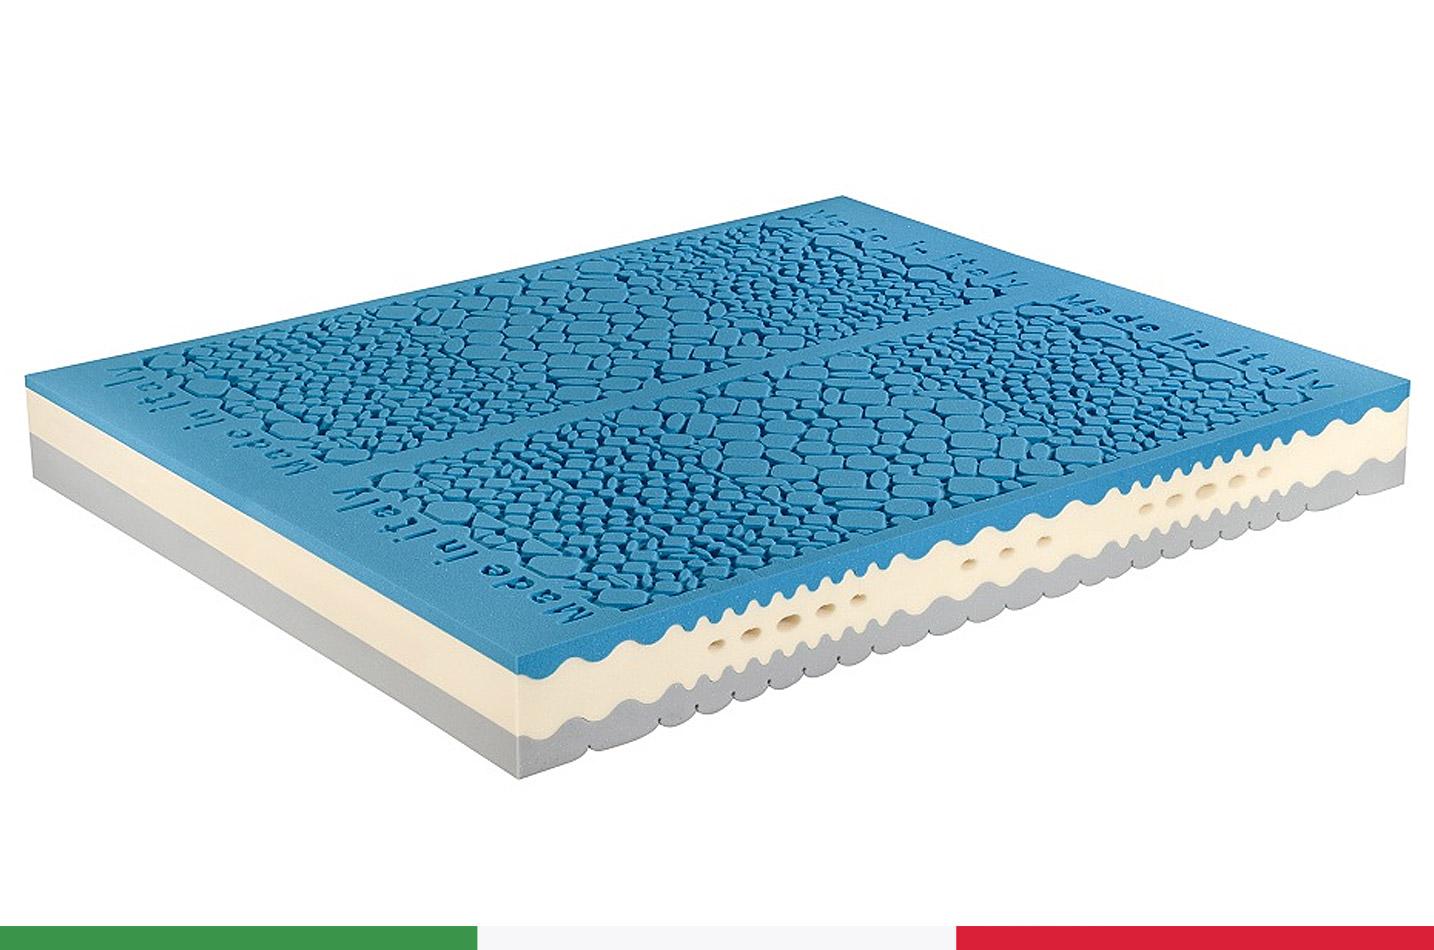 materasso memory ortopedico sanitario super gel  Italiana